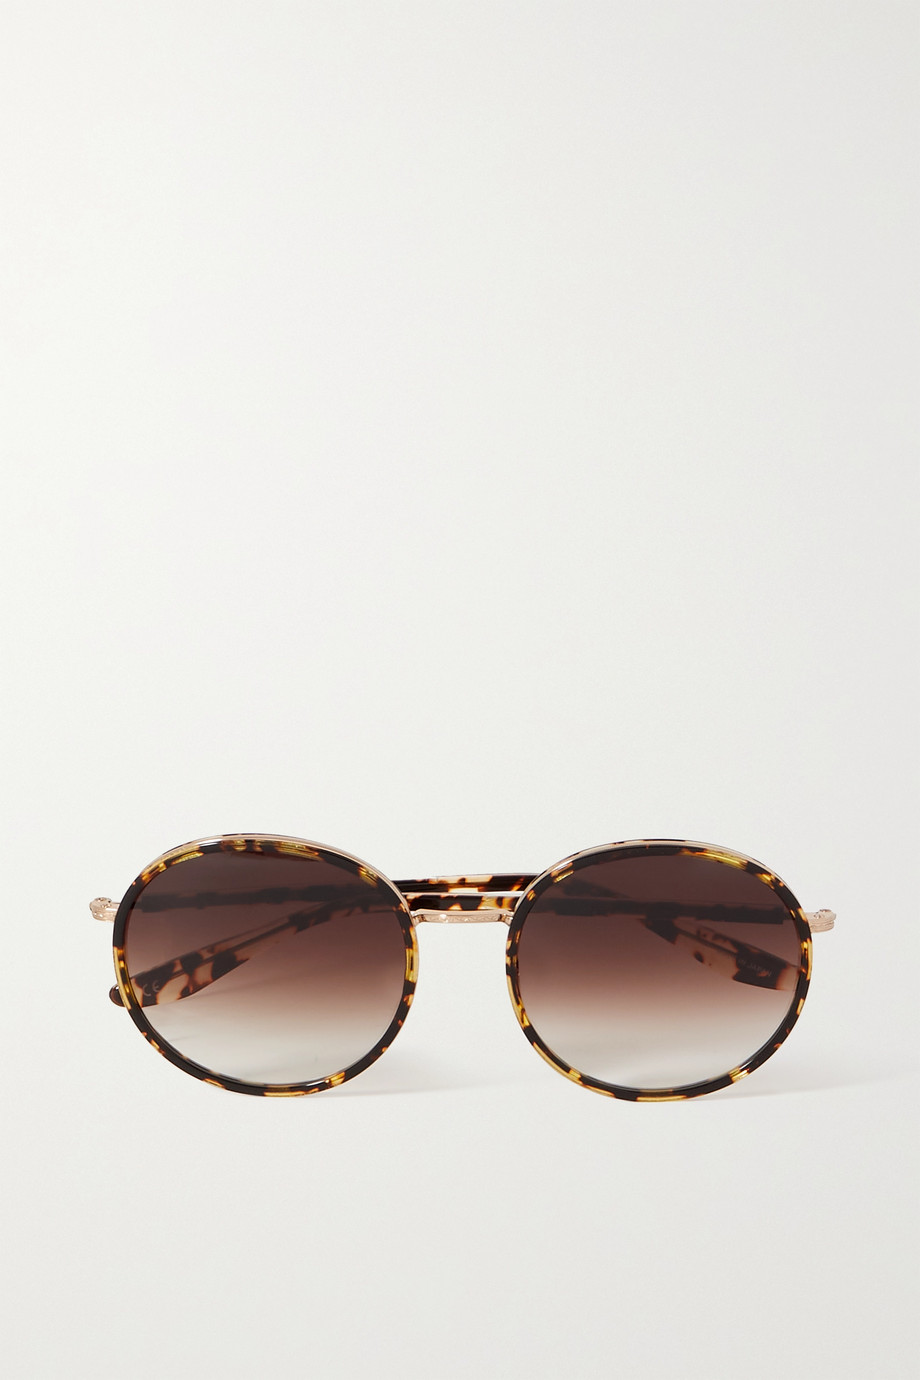 unknown Amorfati round-frame tortoiseshell acetate and gold-tone sunglasses